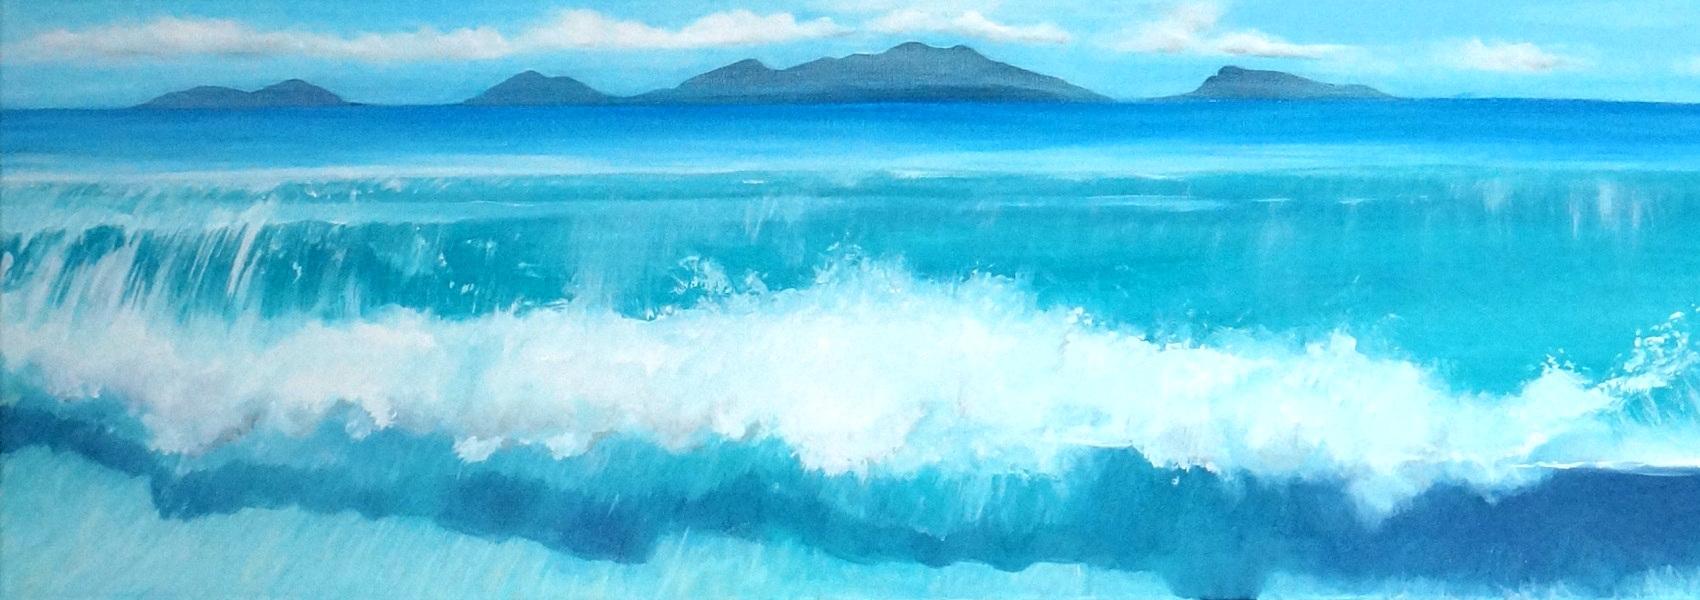 Horizont 2 | Öl auf Leinwand | 35 x 100 cm